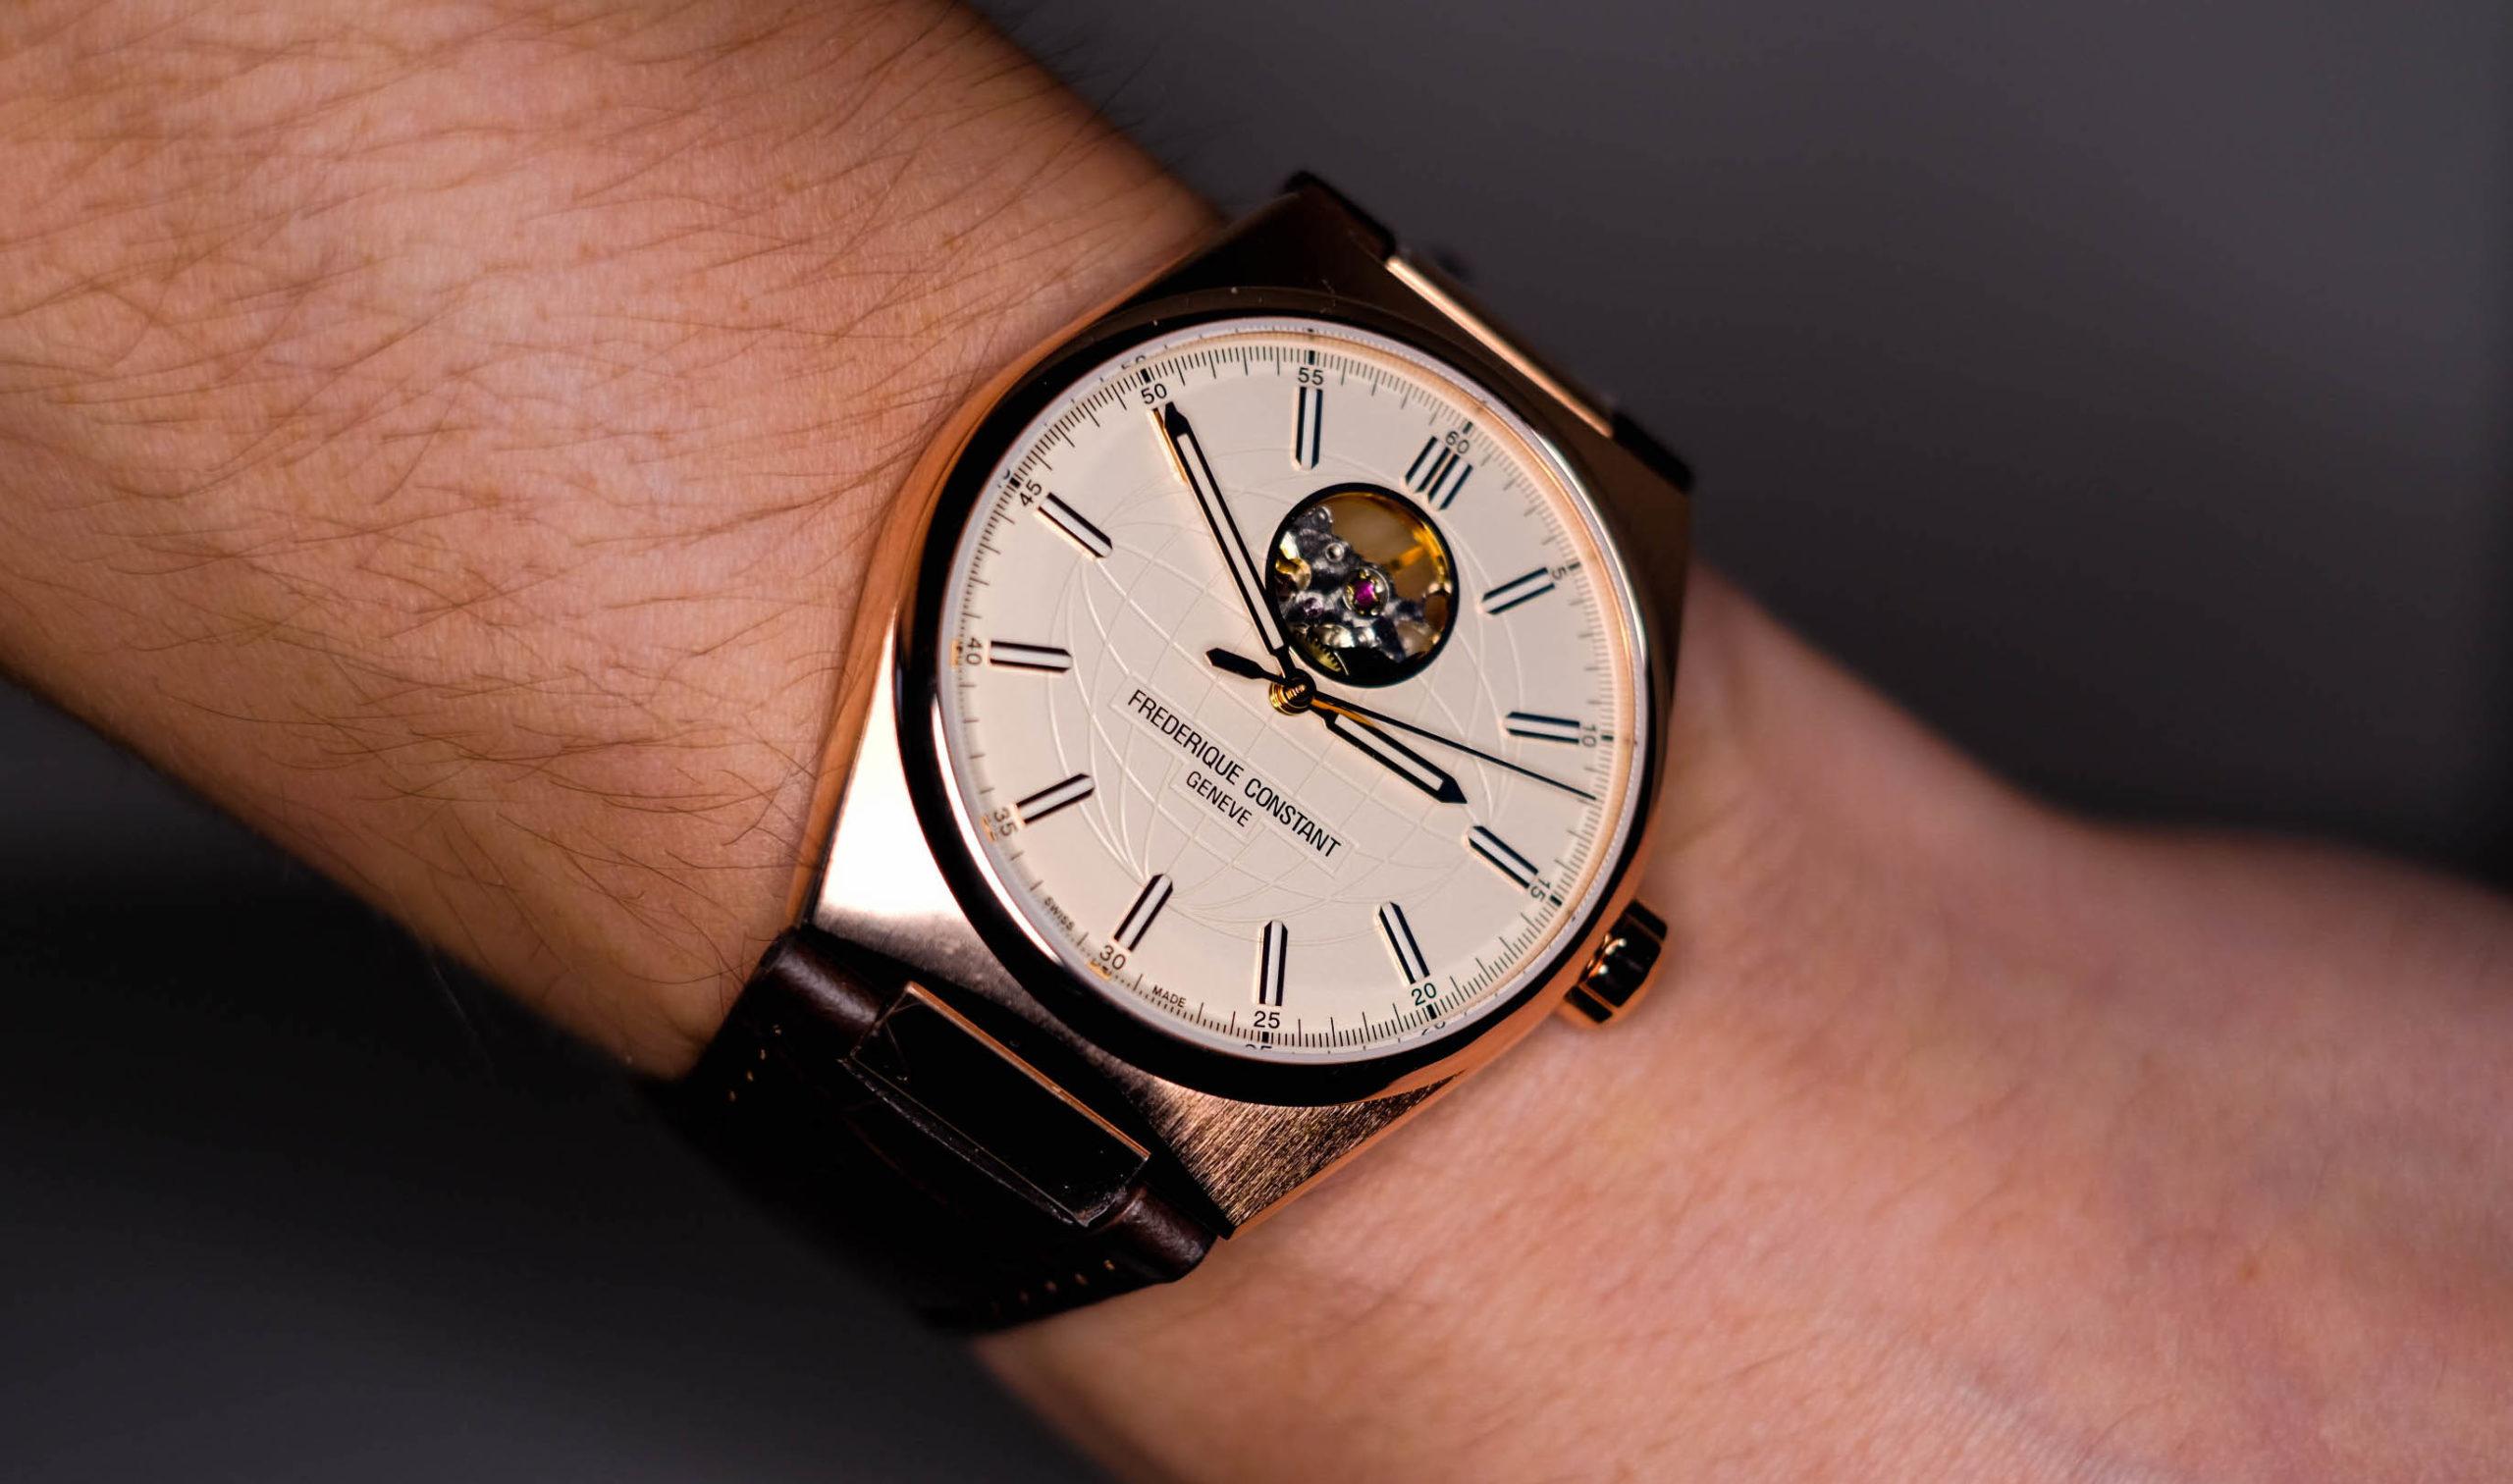 Wrist shot of Frederique Constant Highlife